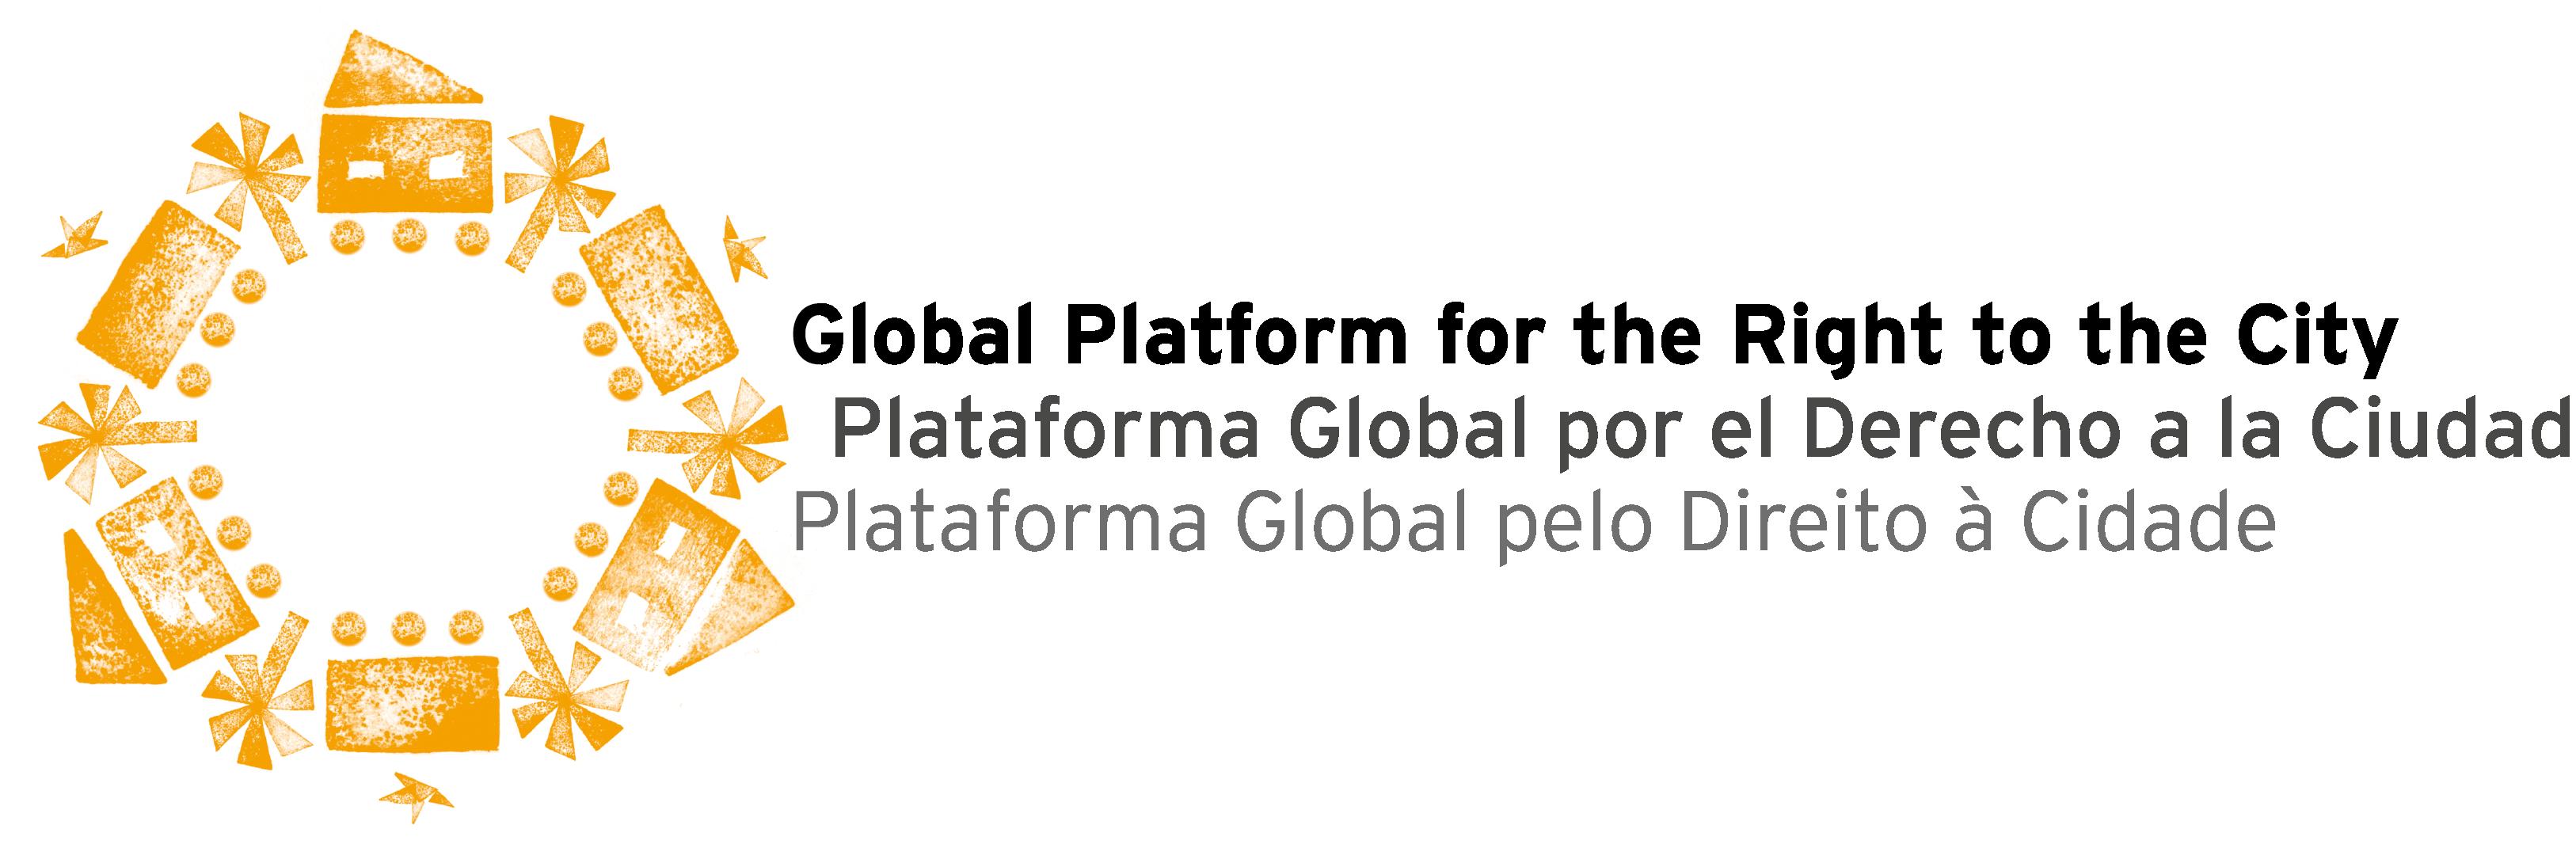 gpr2c logo